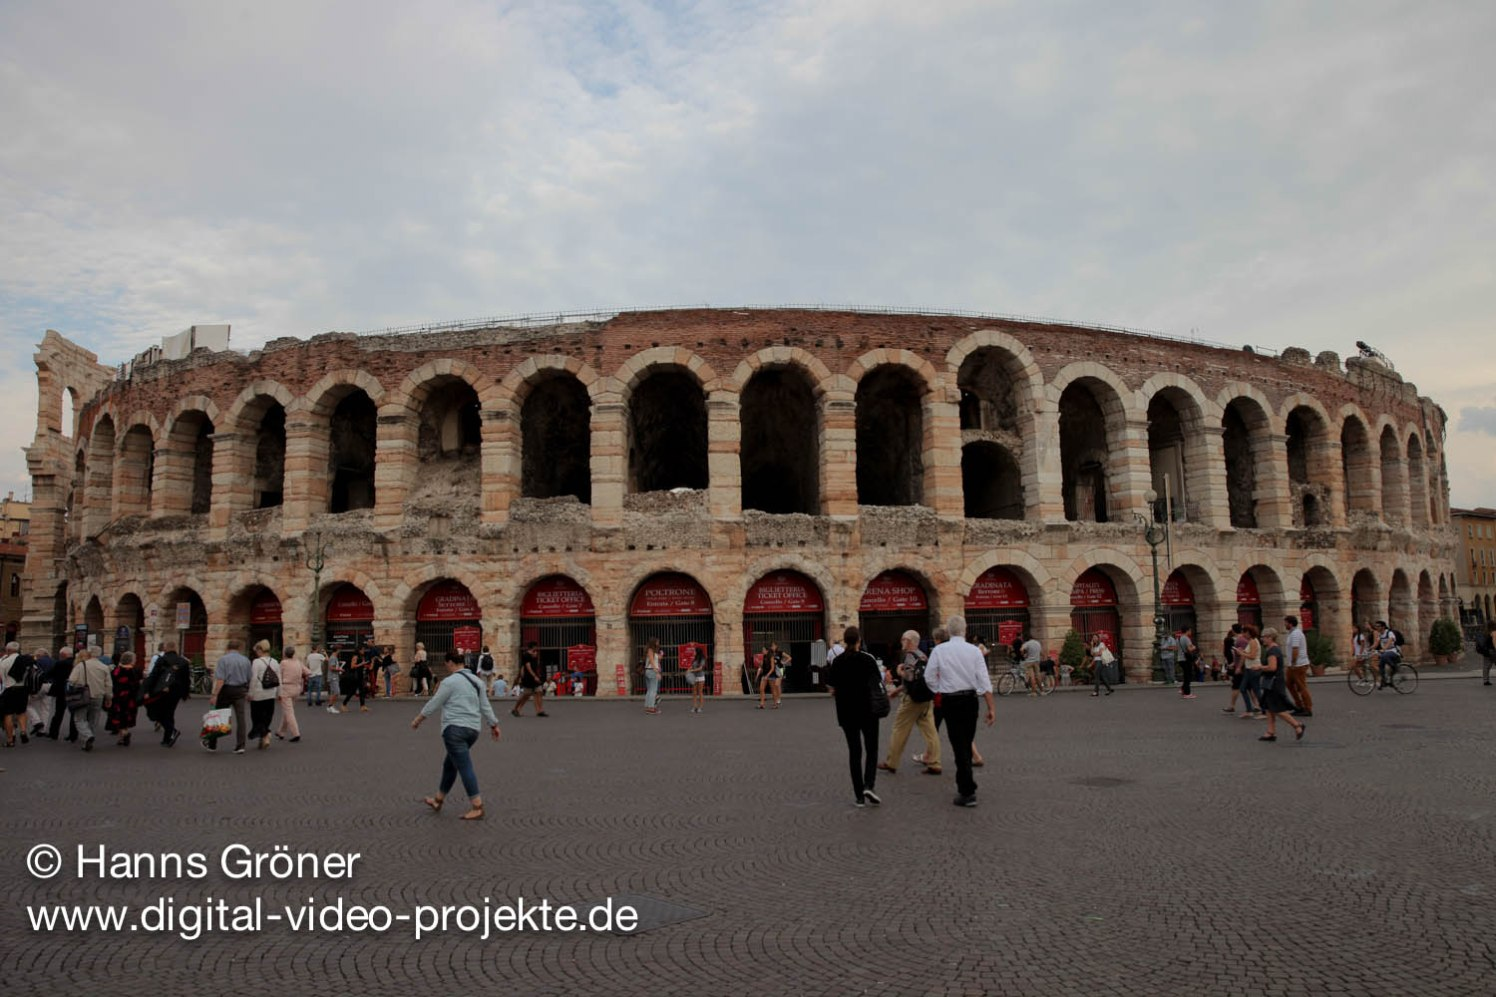 Italien |Arena di Verona